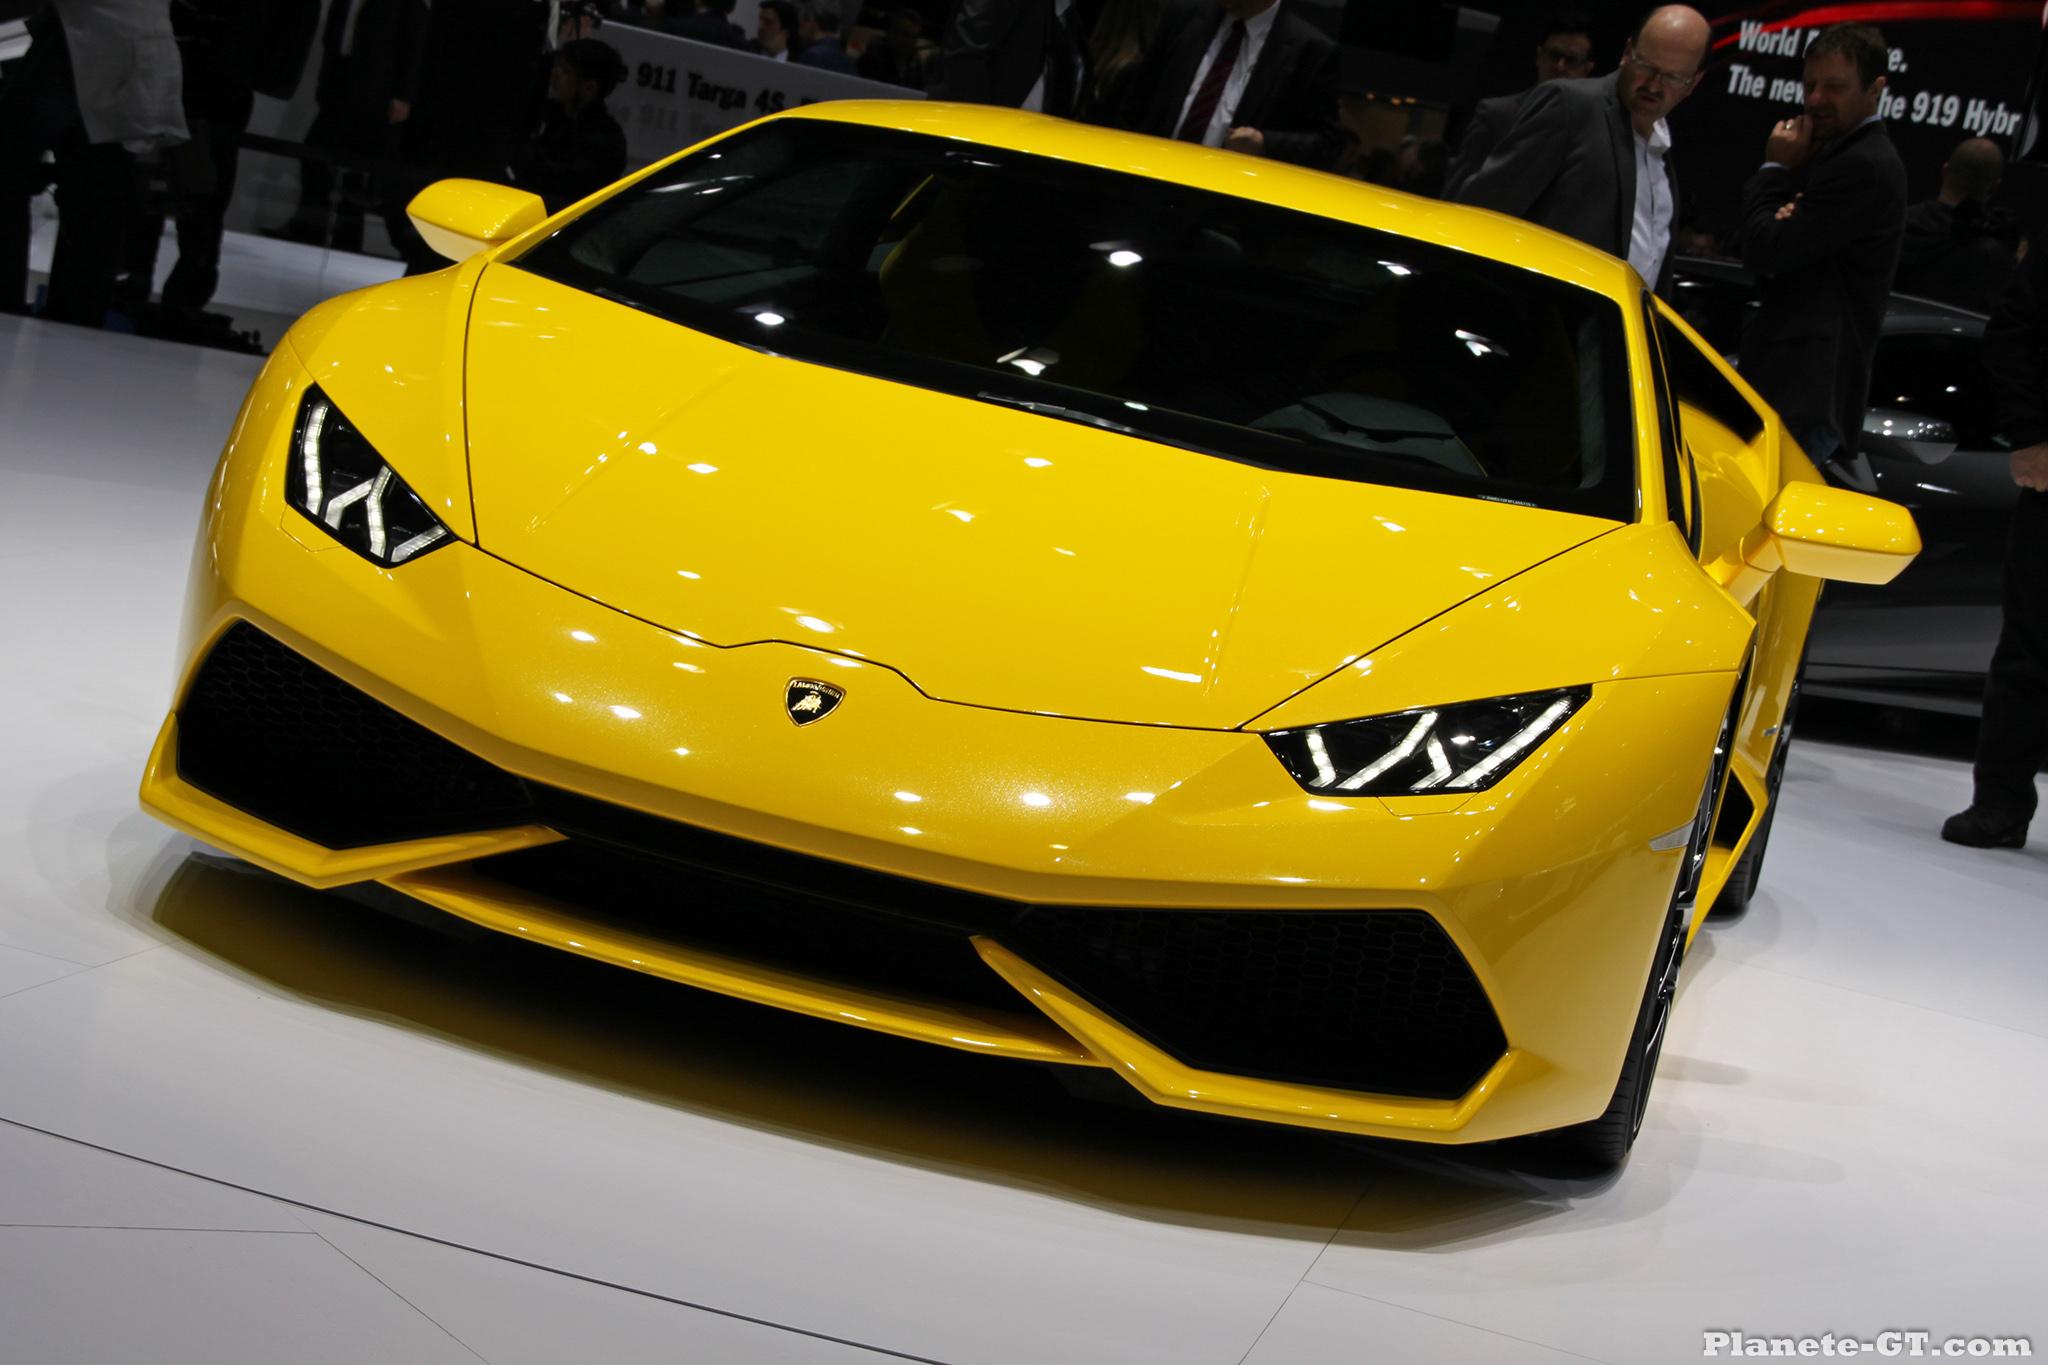 Front End Exterior 2015 Lamborghini Huracan Lp610 4 6205 Cars